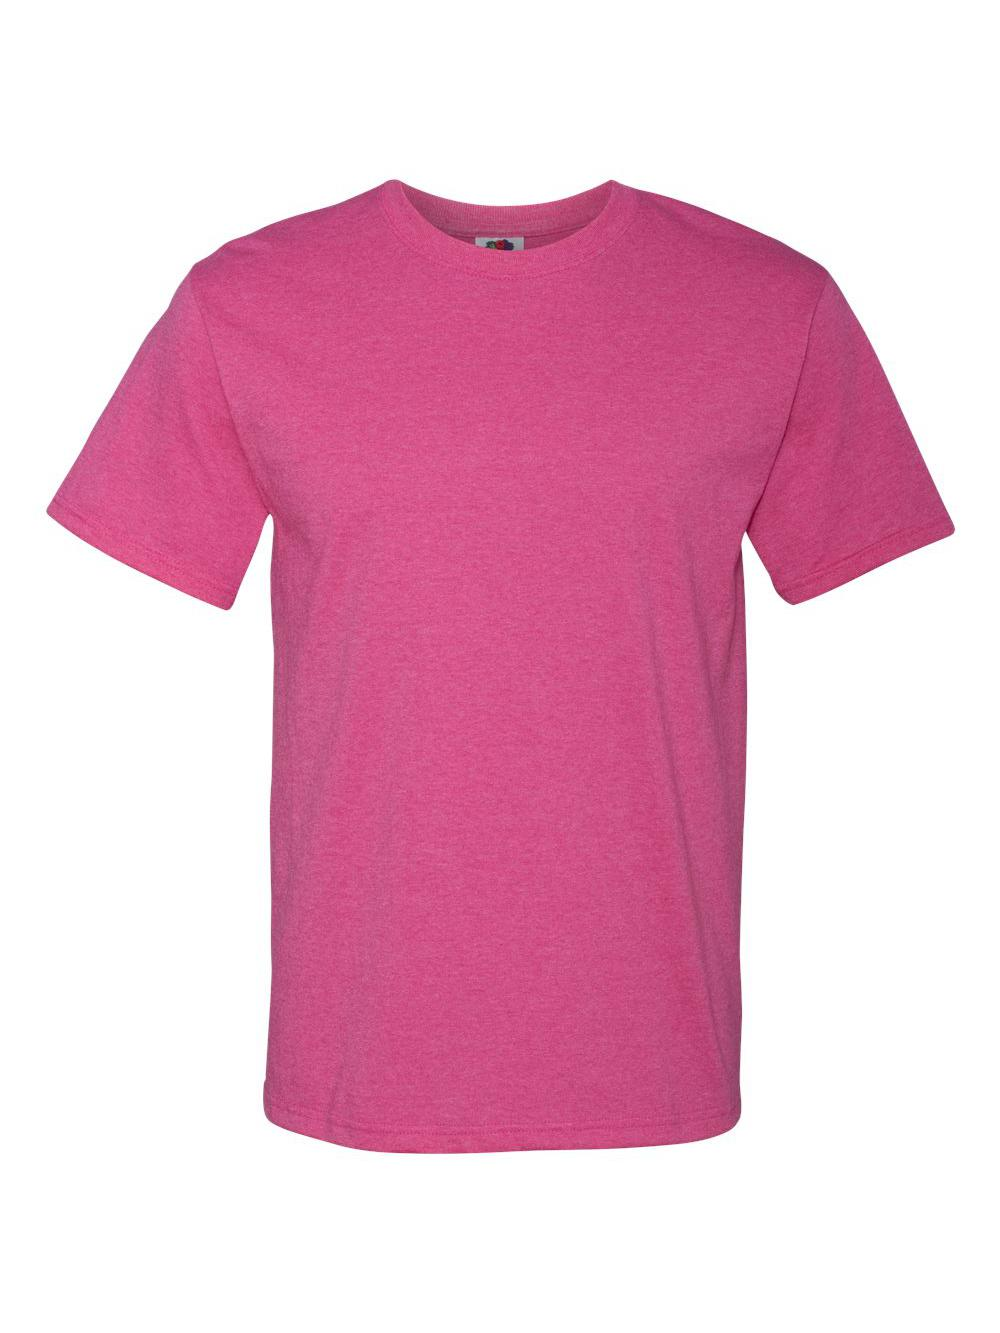 Fruit-of-the-Loom-HD-Cotton-Short-Sleeve-T-Shirt-3930R thumbnail 102